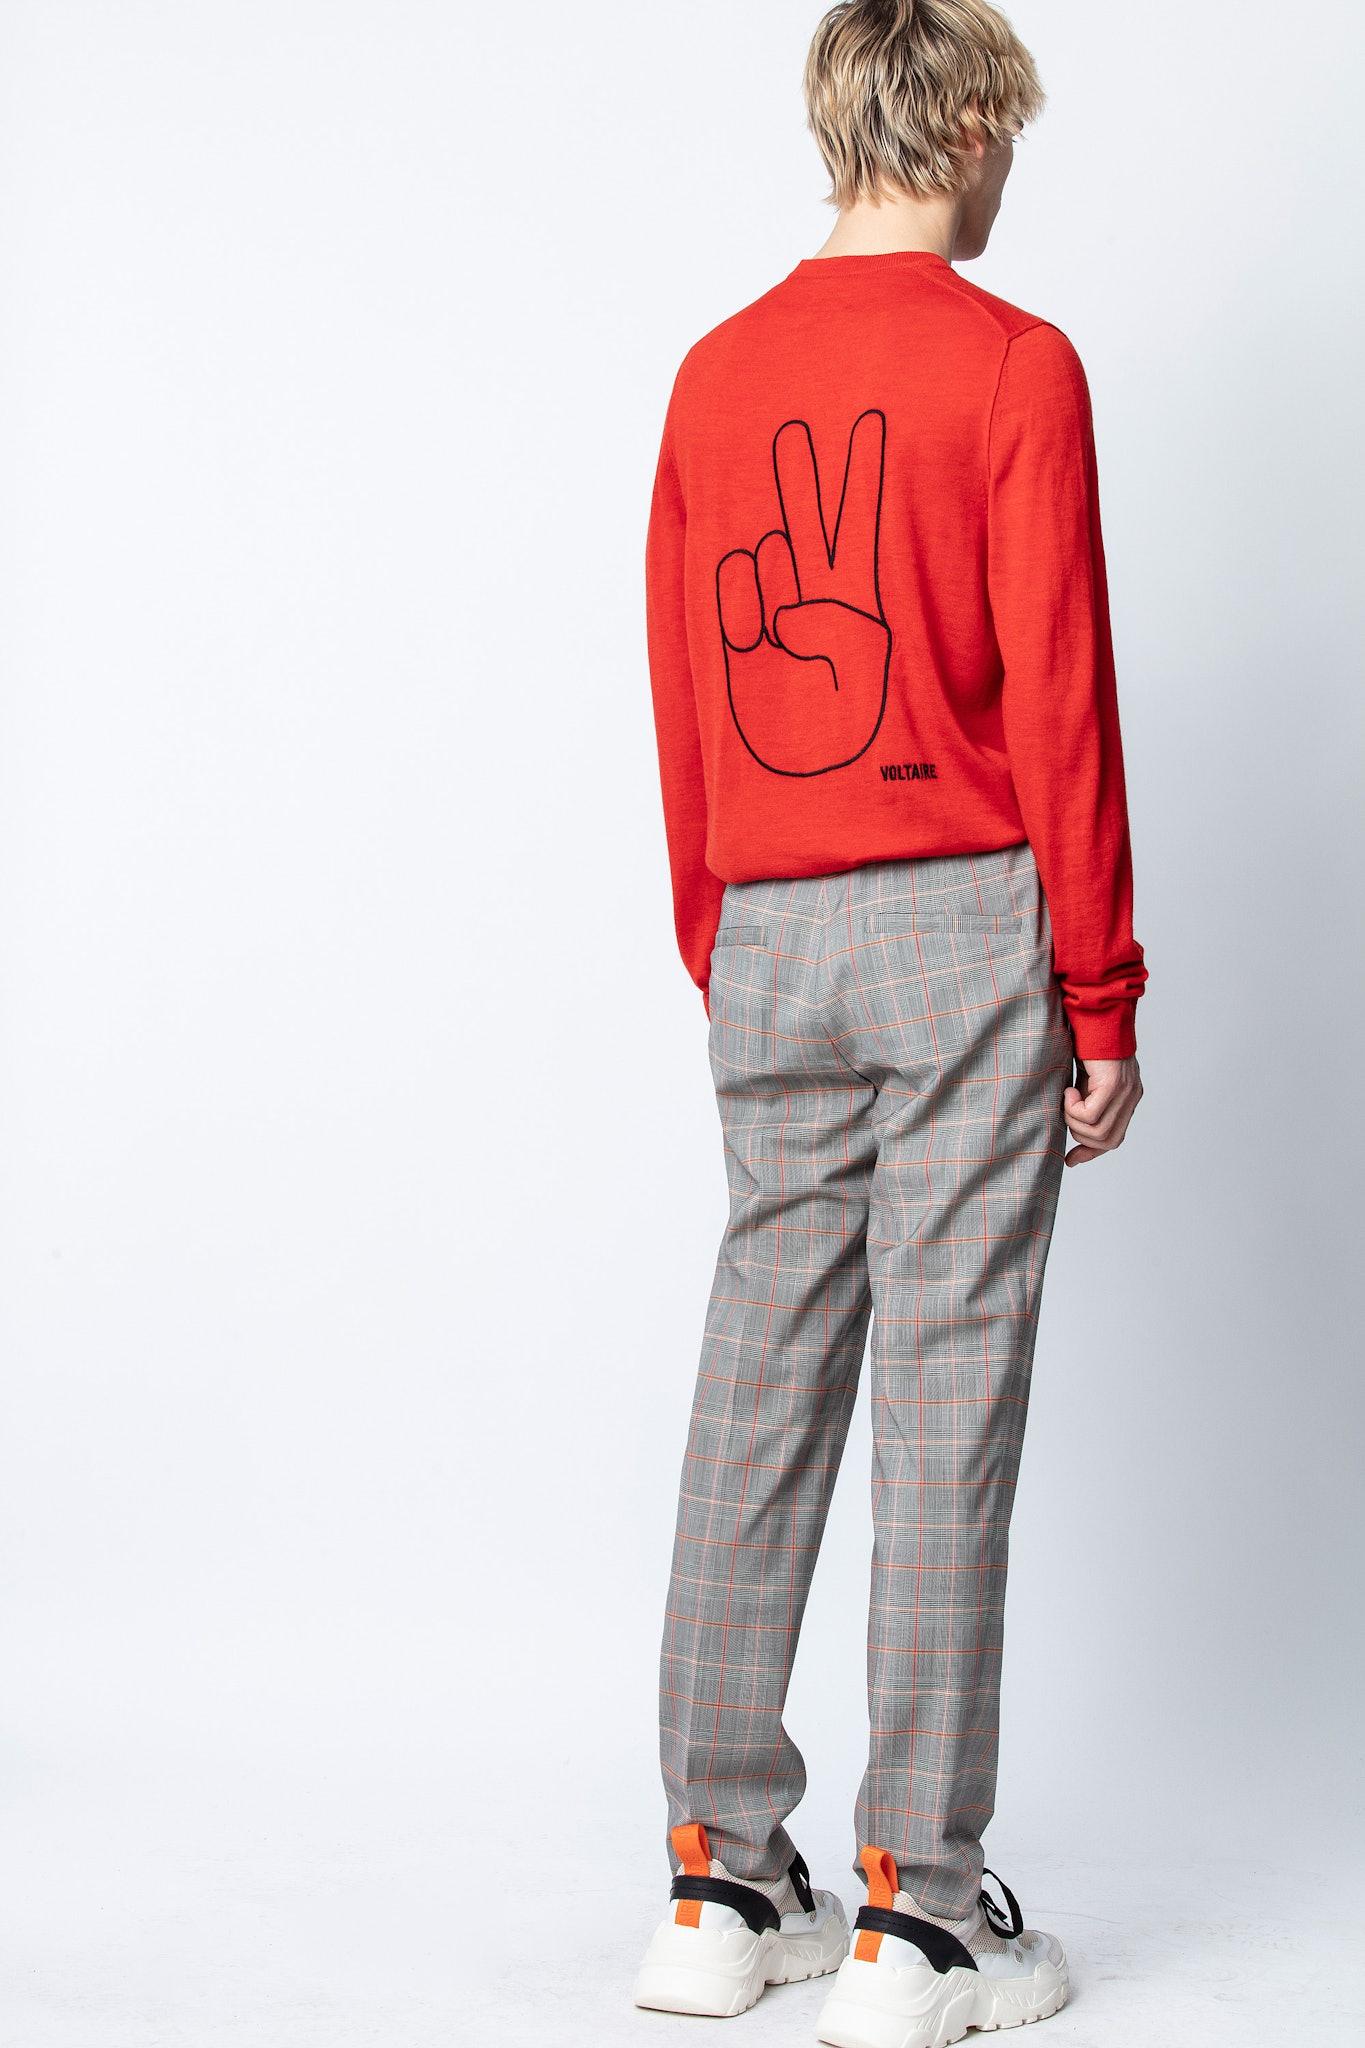 Kennedy Peace Sweater